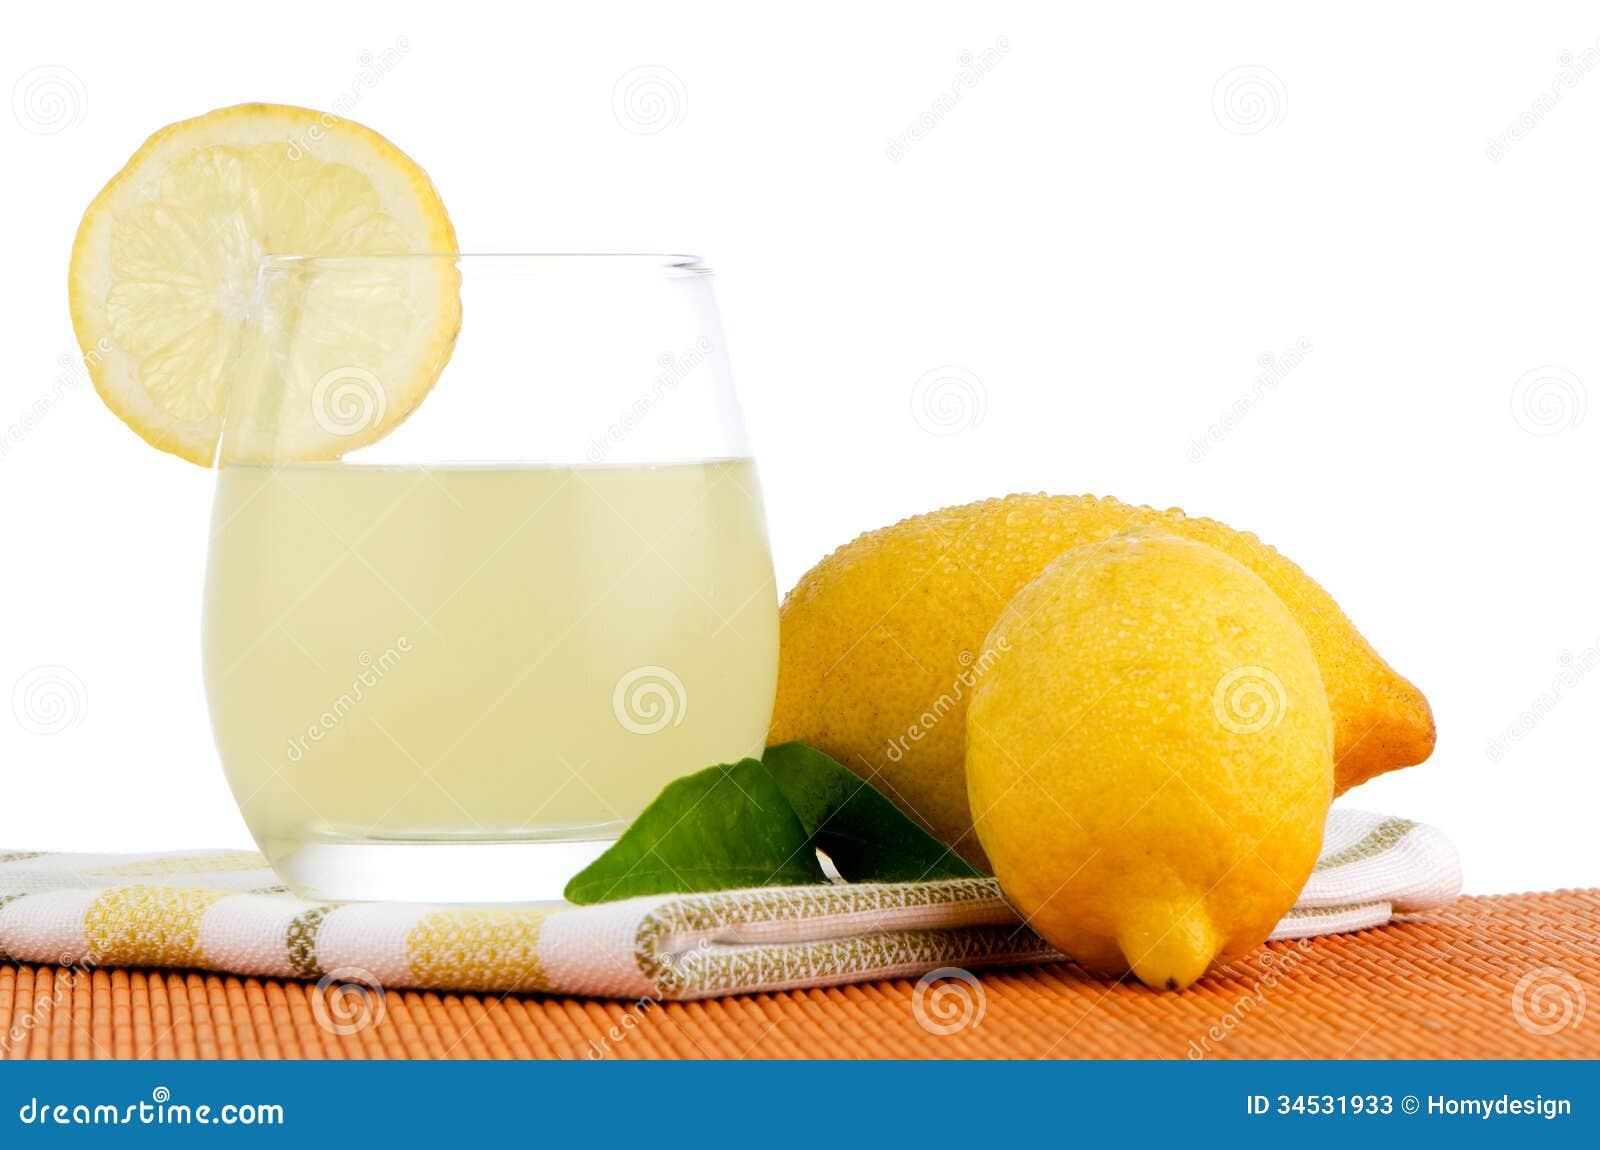 how to make fresh lemon juice